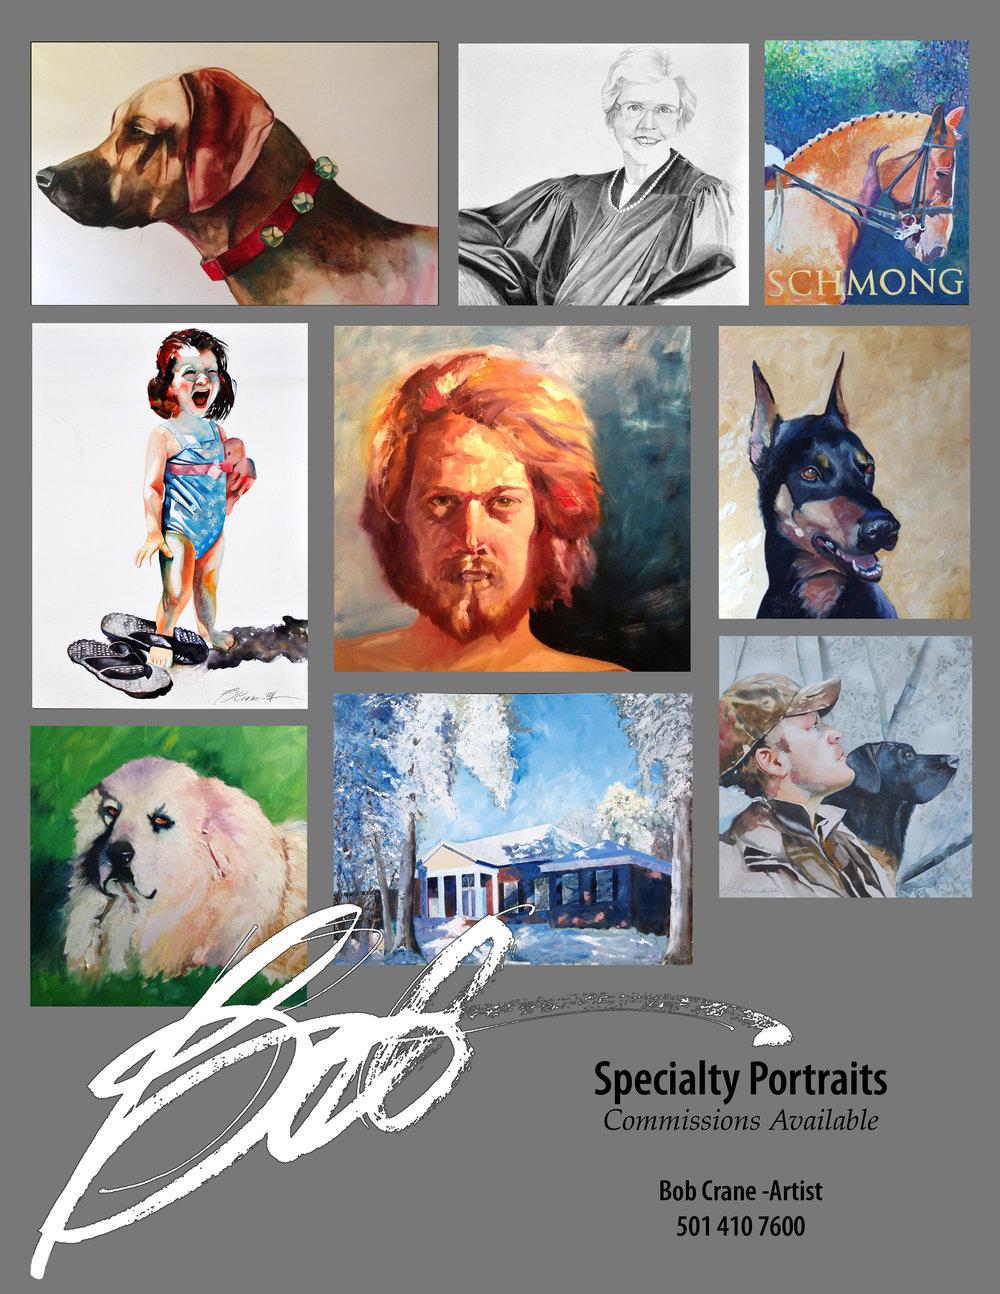 Promo_portraiture copy.jpg